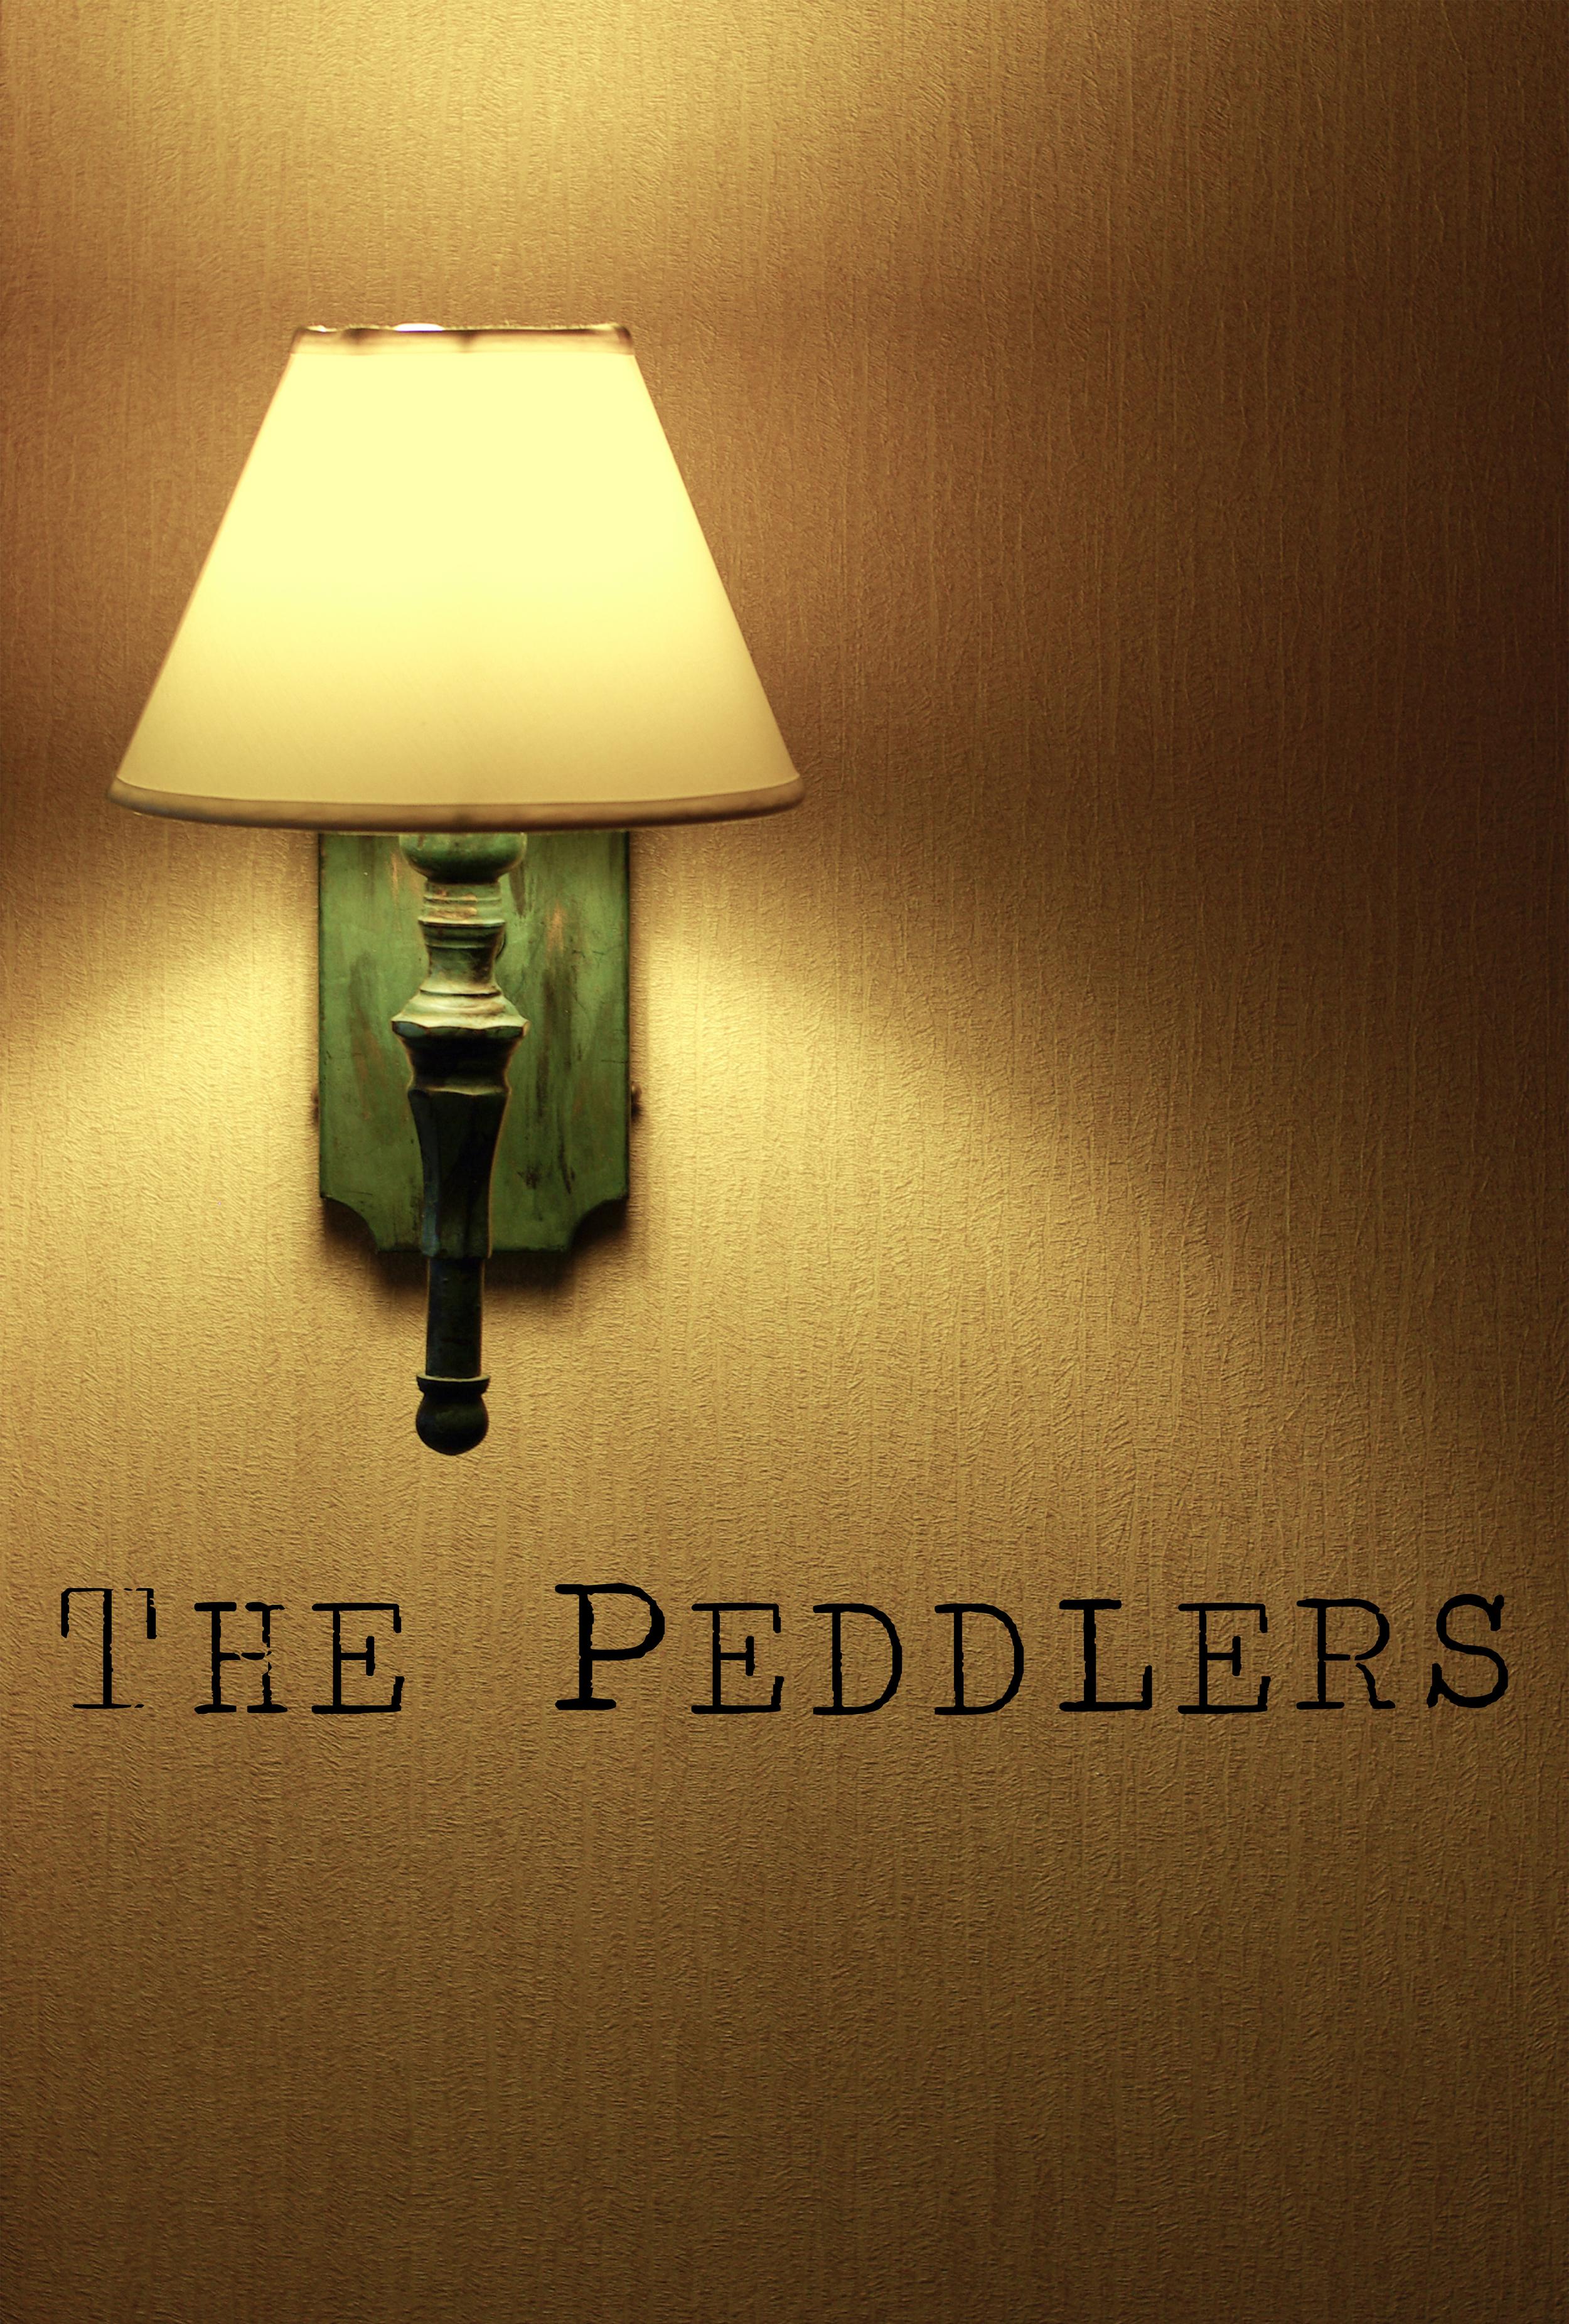 The Peddlers.jpg